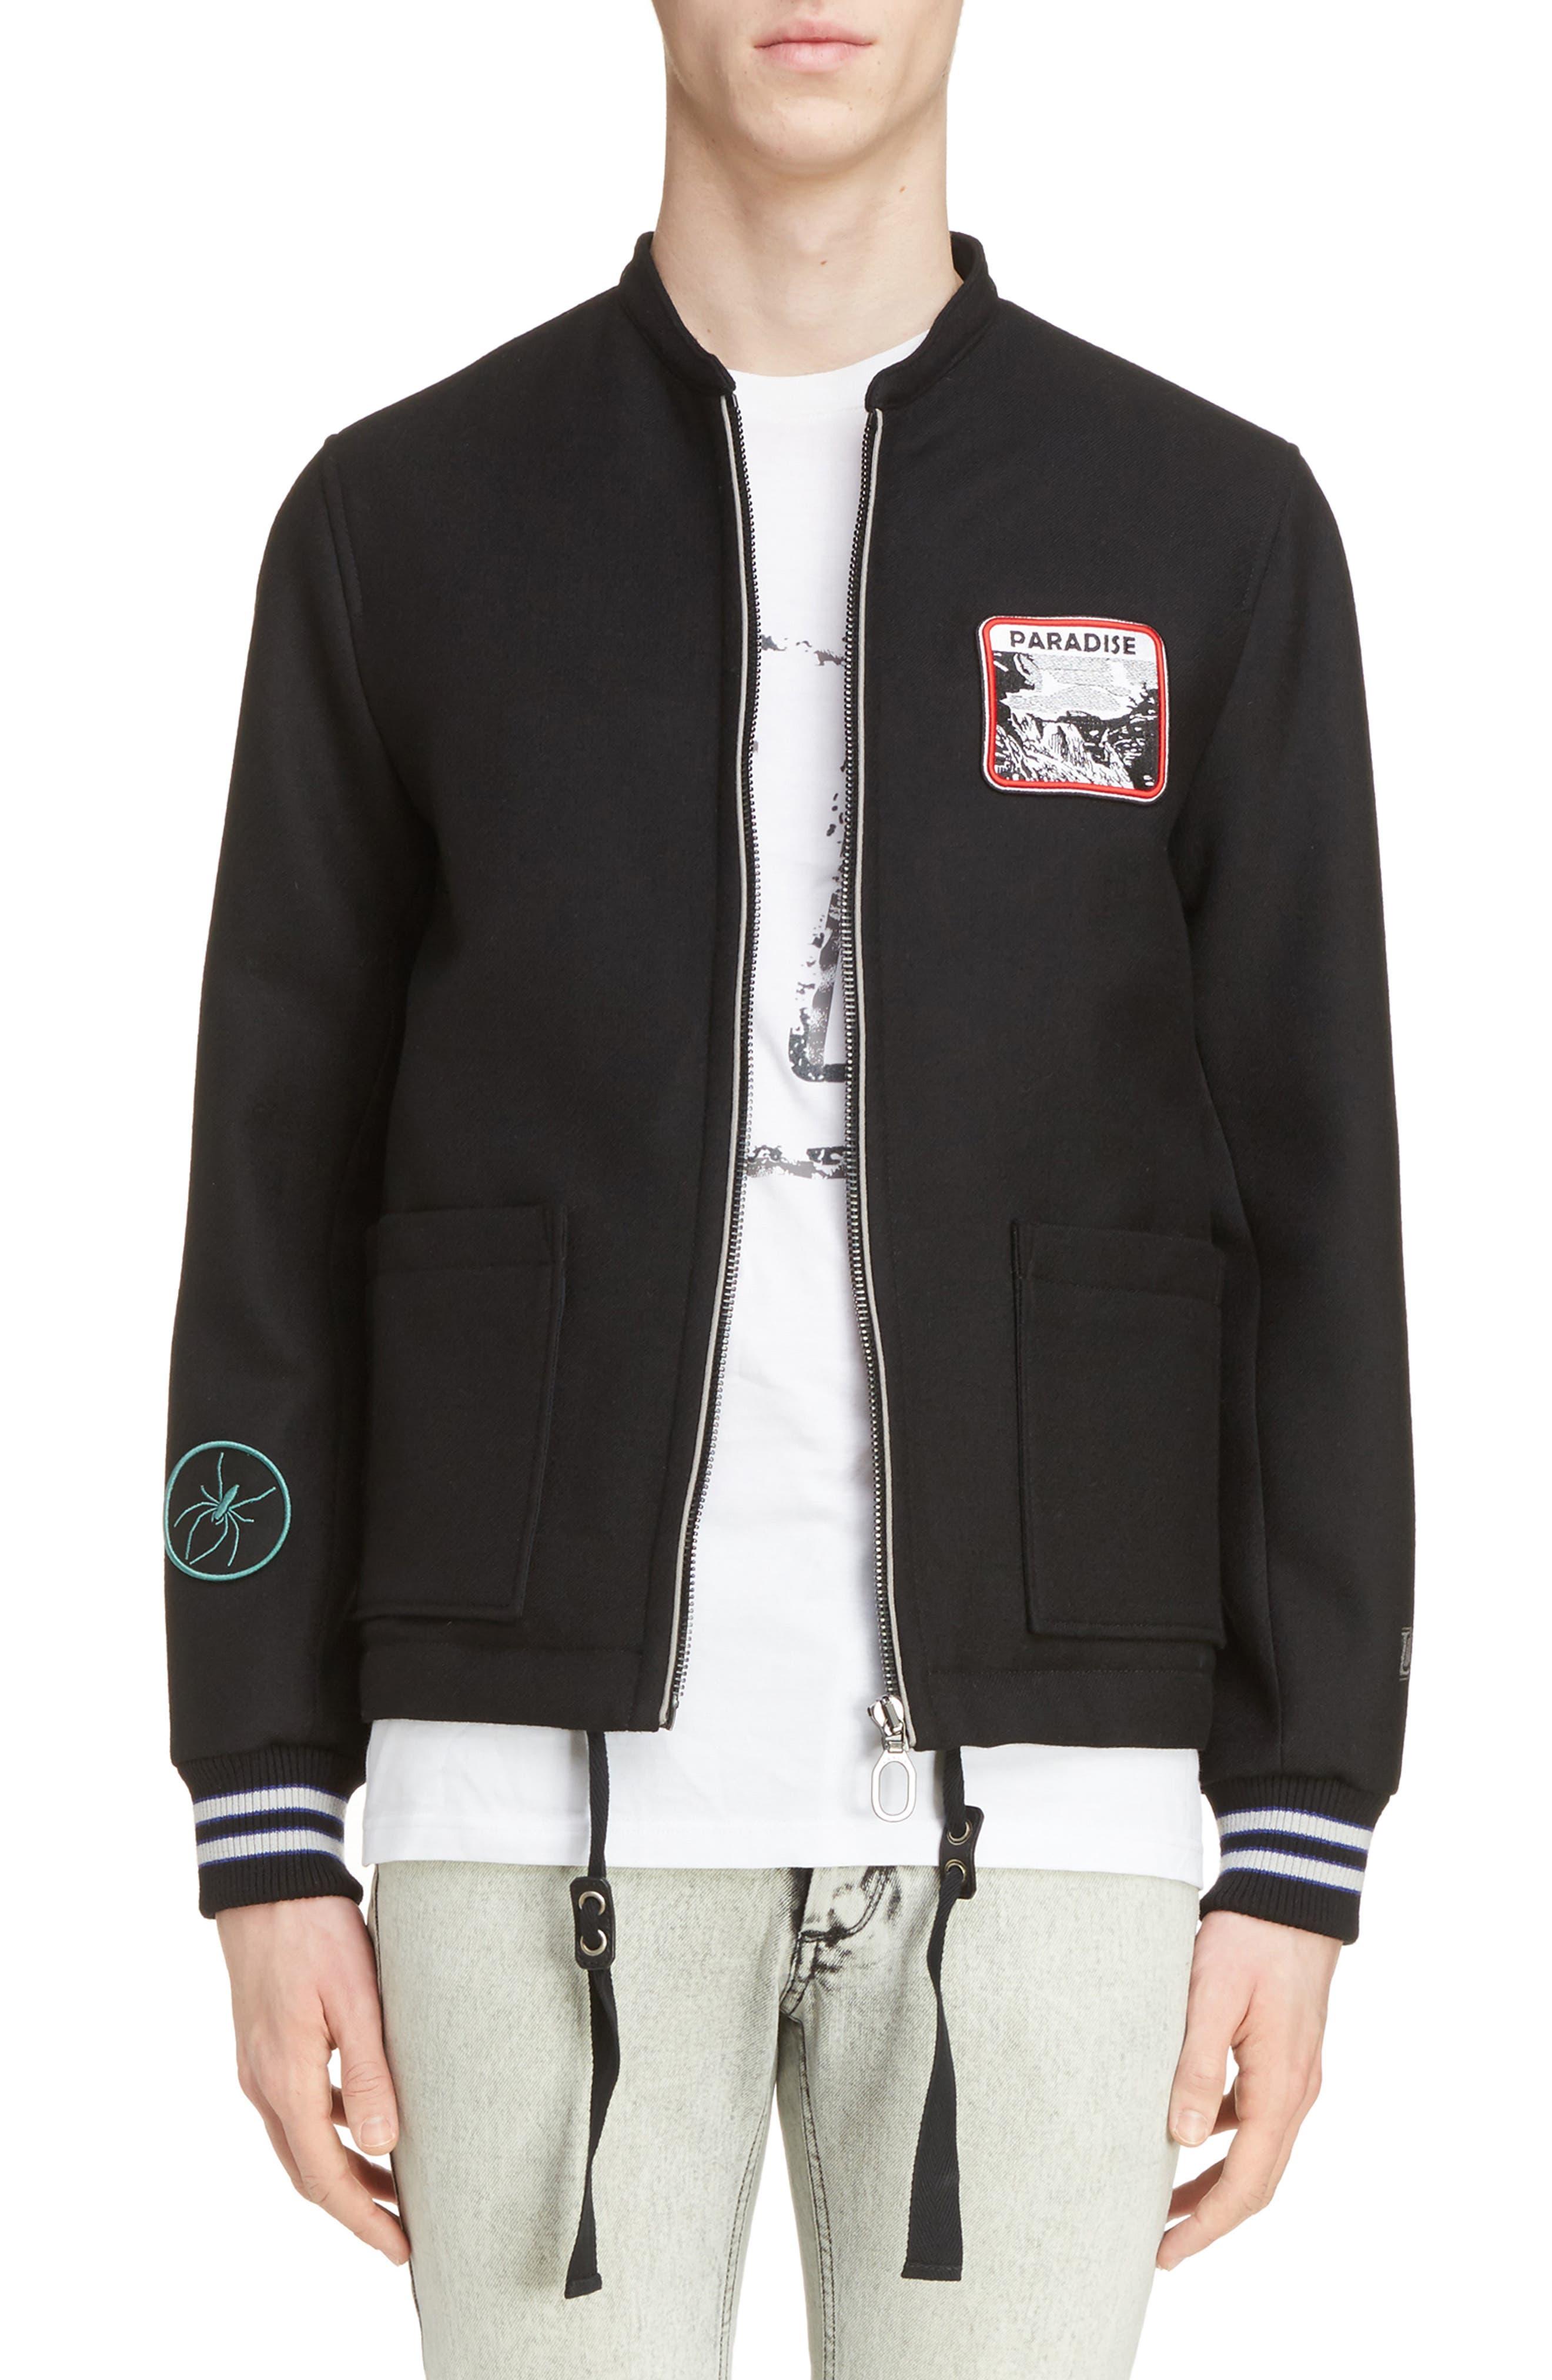 Paradise Patch Bomber Jacket,                         Main,                         color, Black